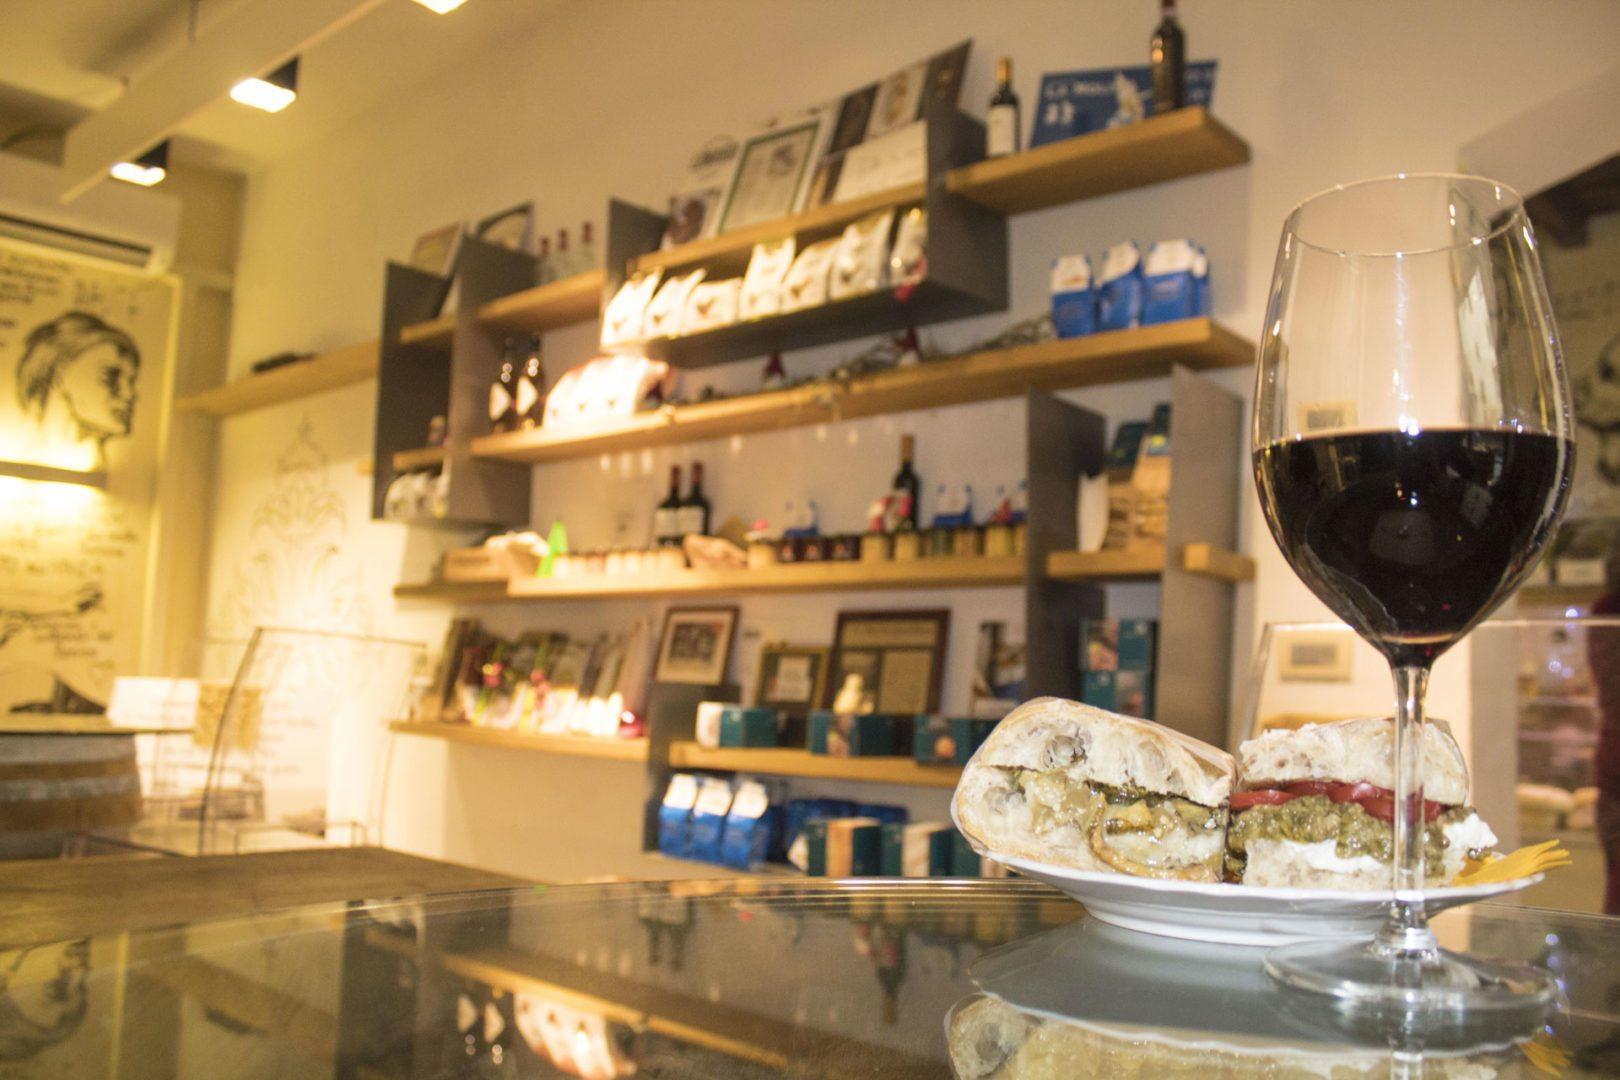 Street Food A Firenze: INO E I Panini Di Alessandro Frassica